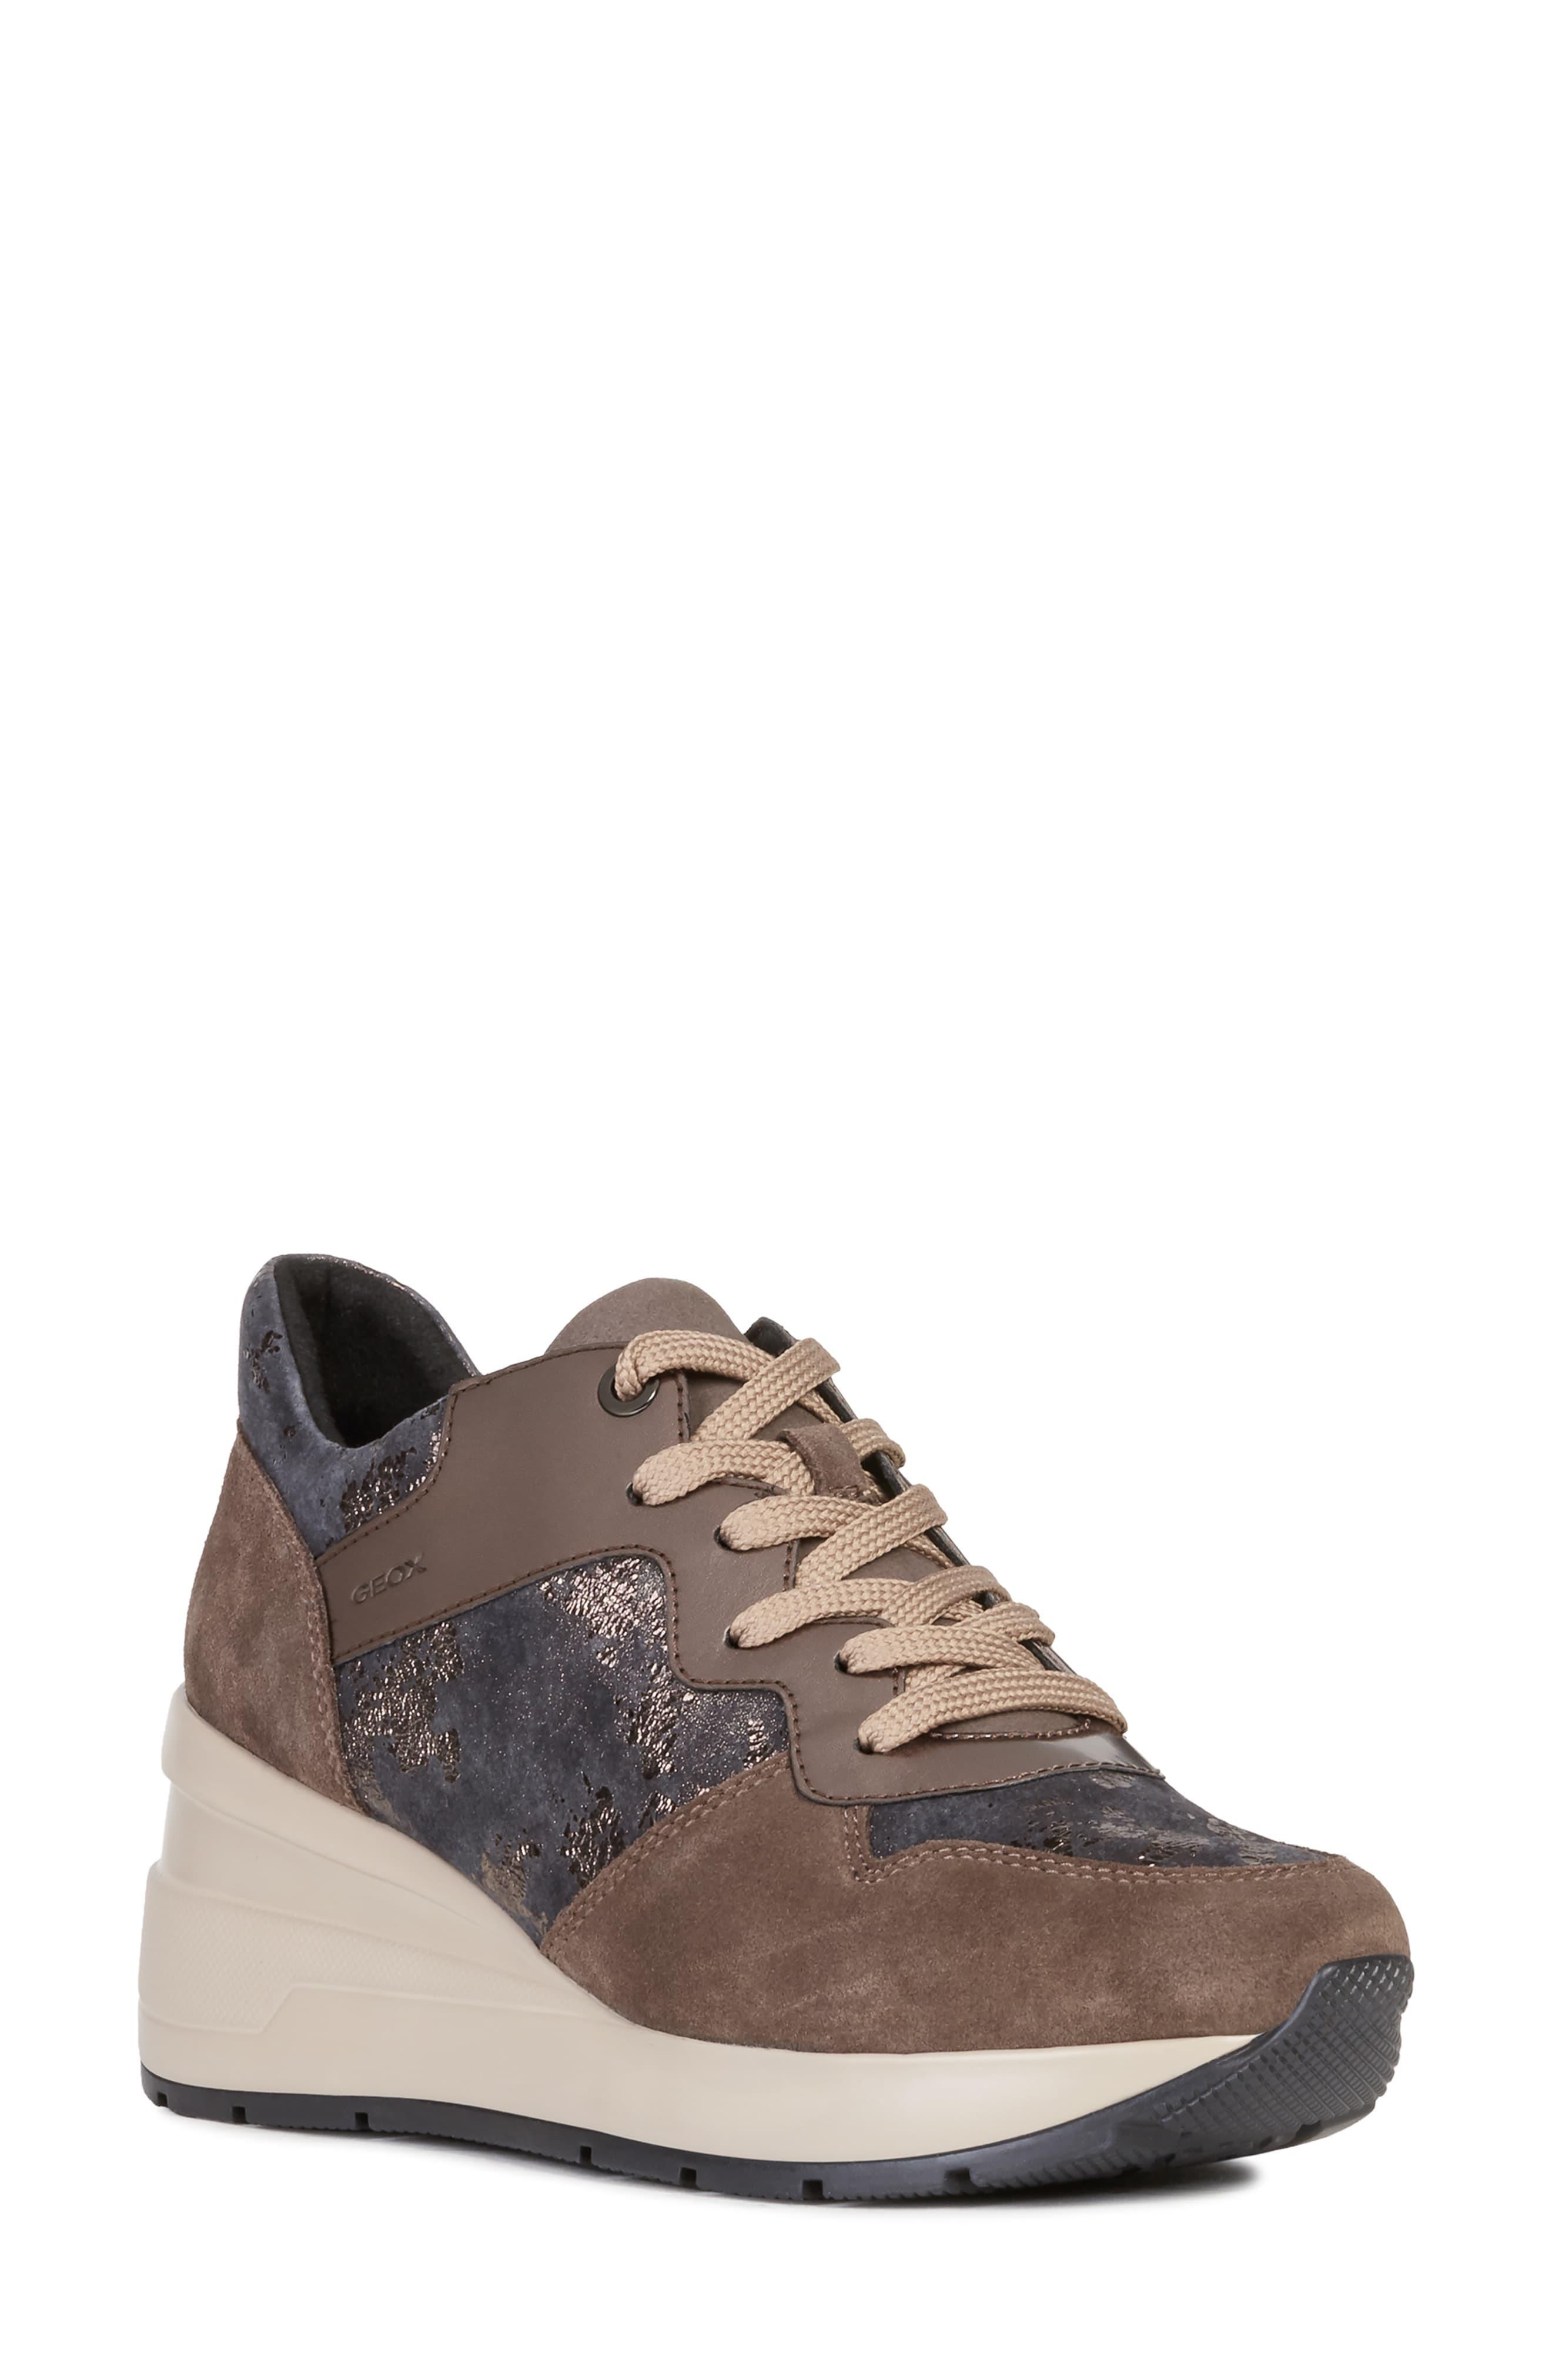 Geox Zosma Wedge Sneaker, $119